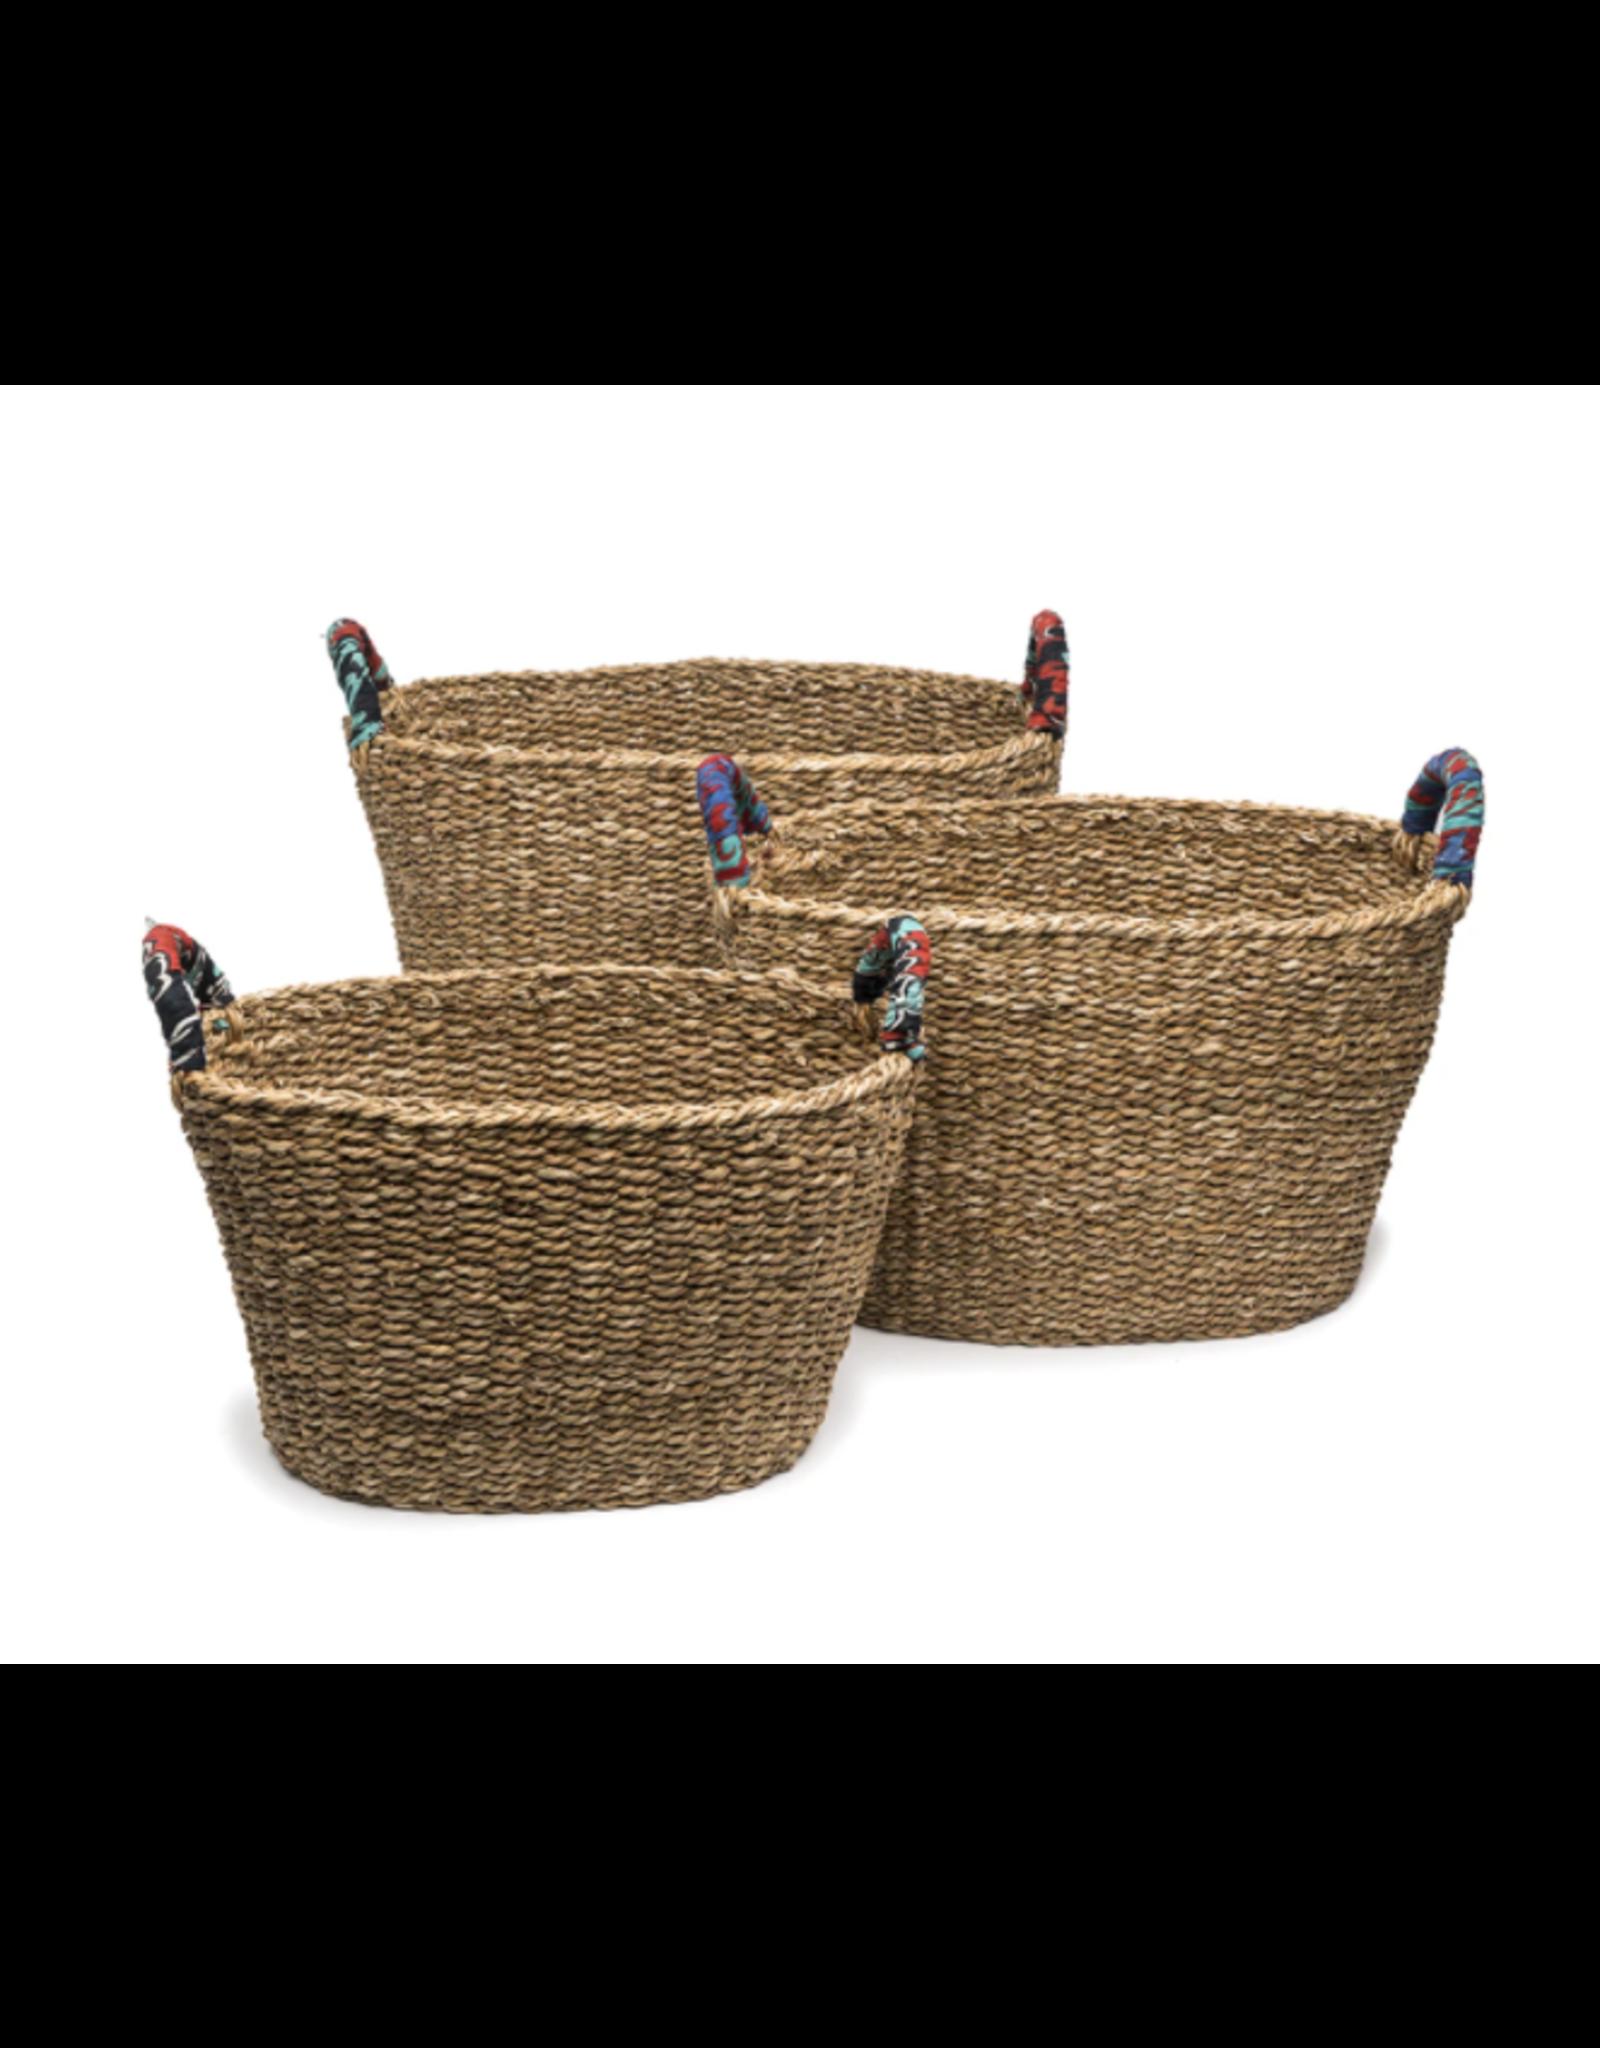 Matr Boomie Sari Handle Floor Baskets, set of 3. India